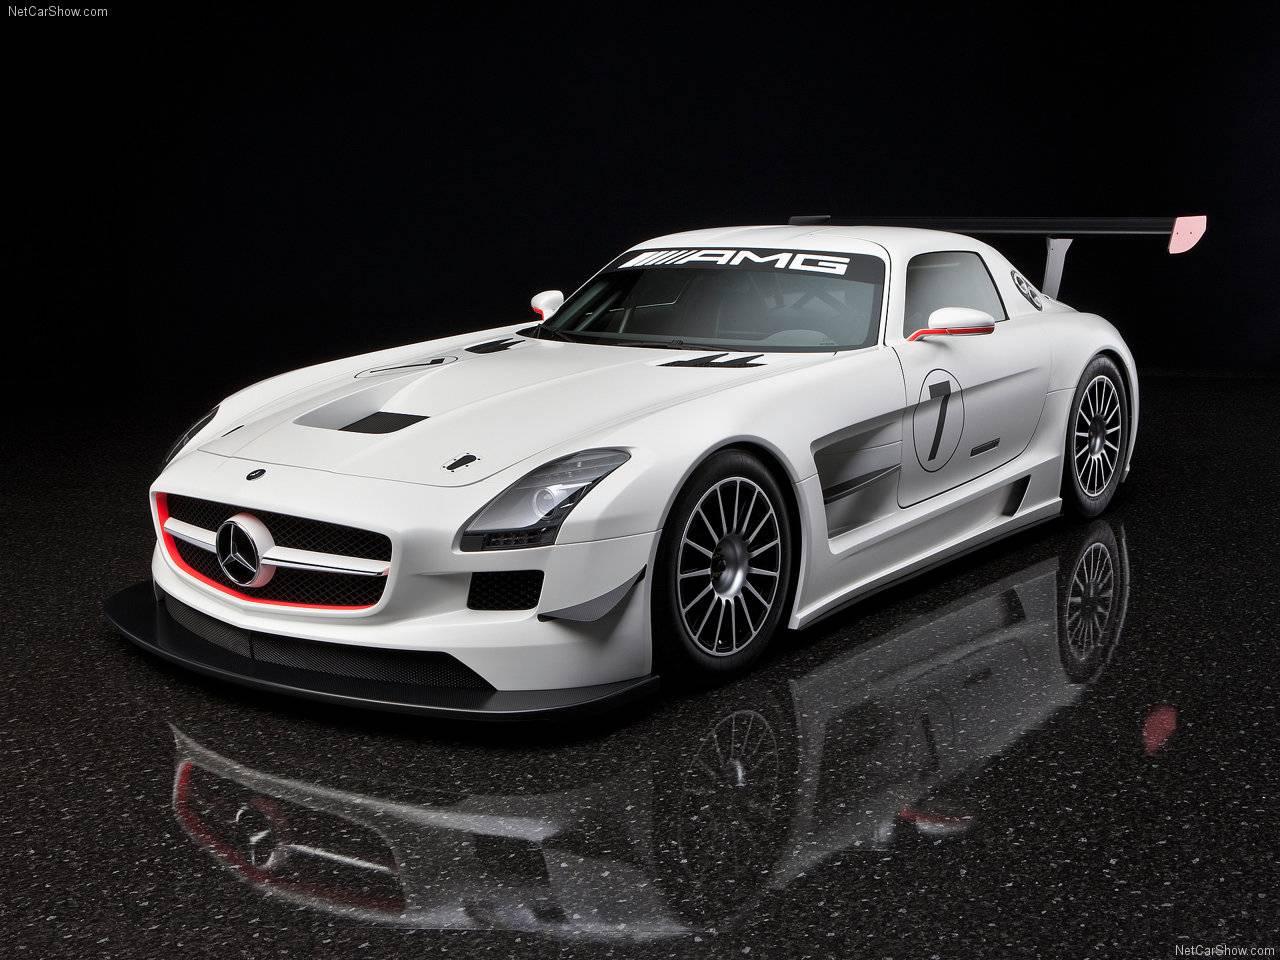 http://1.bp.blogspot.com/_lsyt_wQ2awY/TDLaT_P58dI/AAAAAAAB6gw/m-7liqzr8aU/s1600/Mercedes-Benz-SLS_AMG_GT3_2011_1280x960_wallpaper_07.jpg